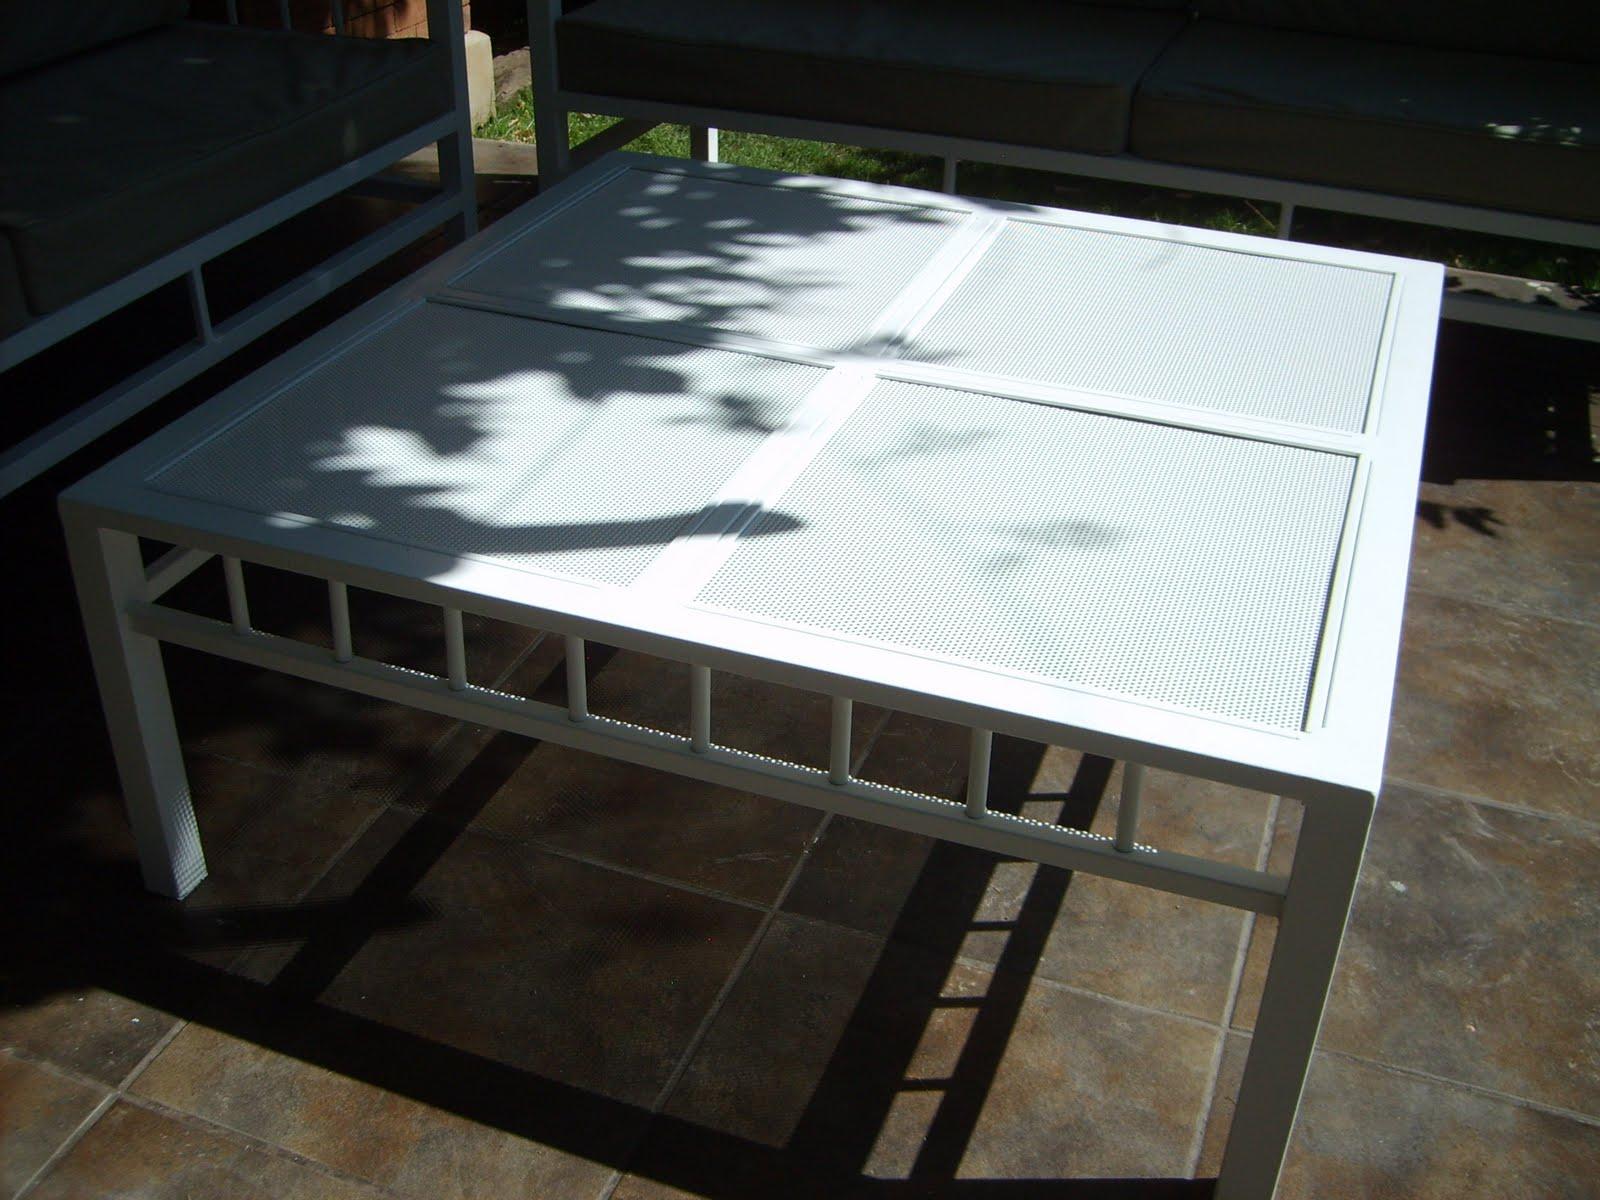 Muebles andrea schoennenbeck juego terraza de fierro for Muebles terraza baratos chile